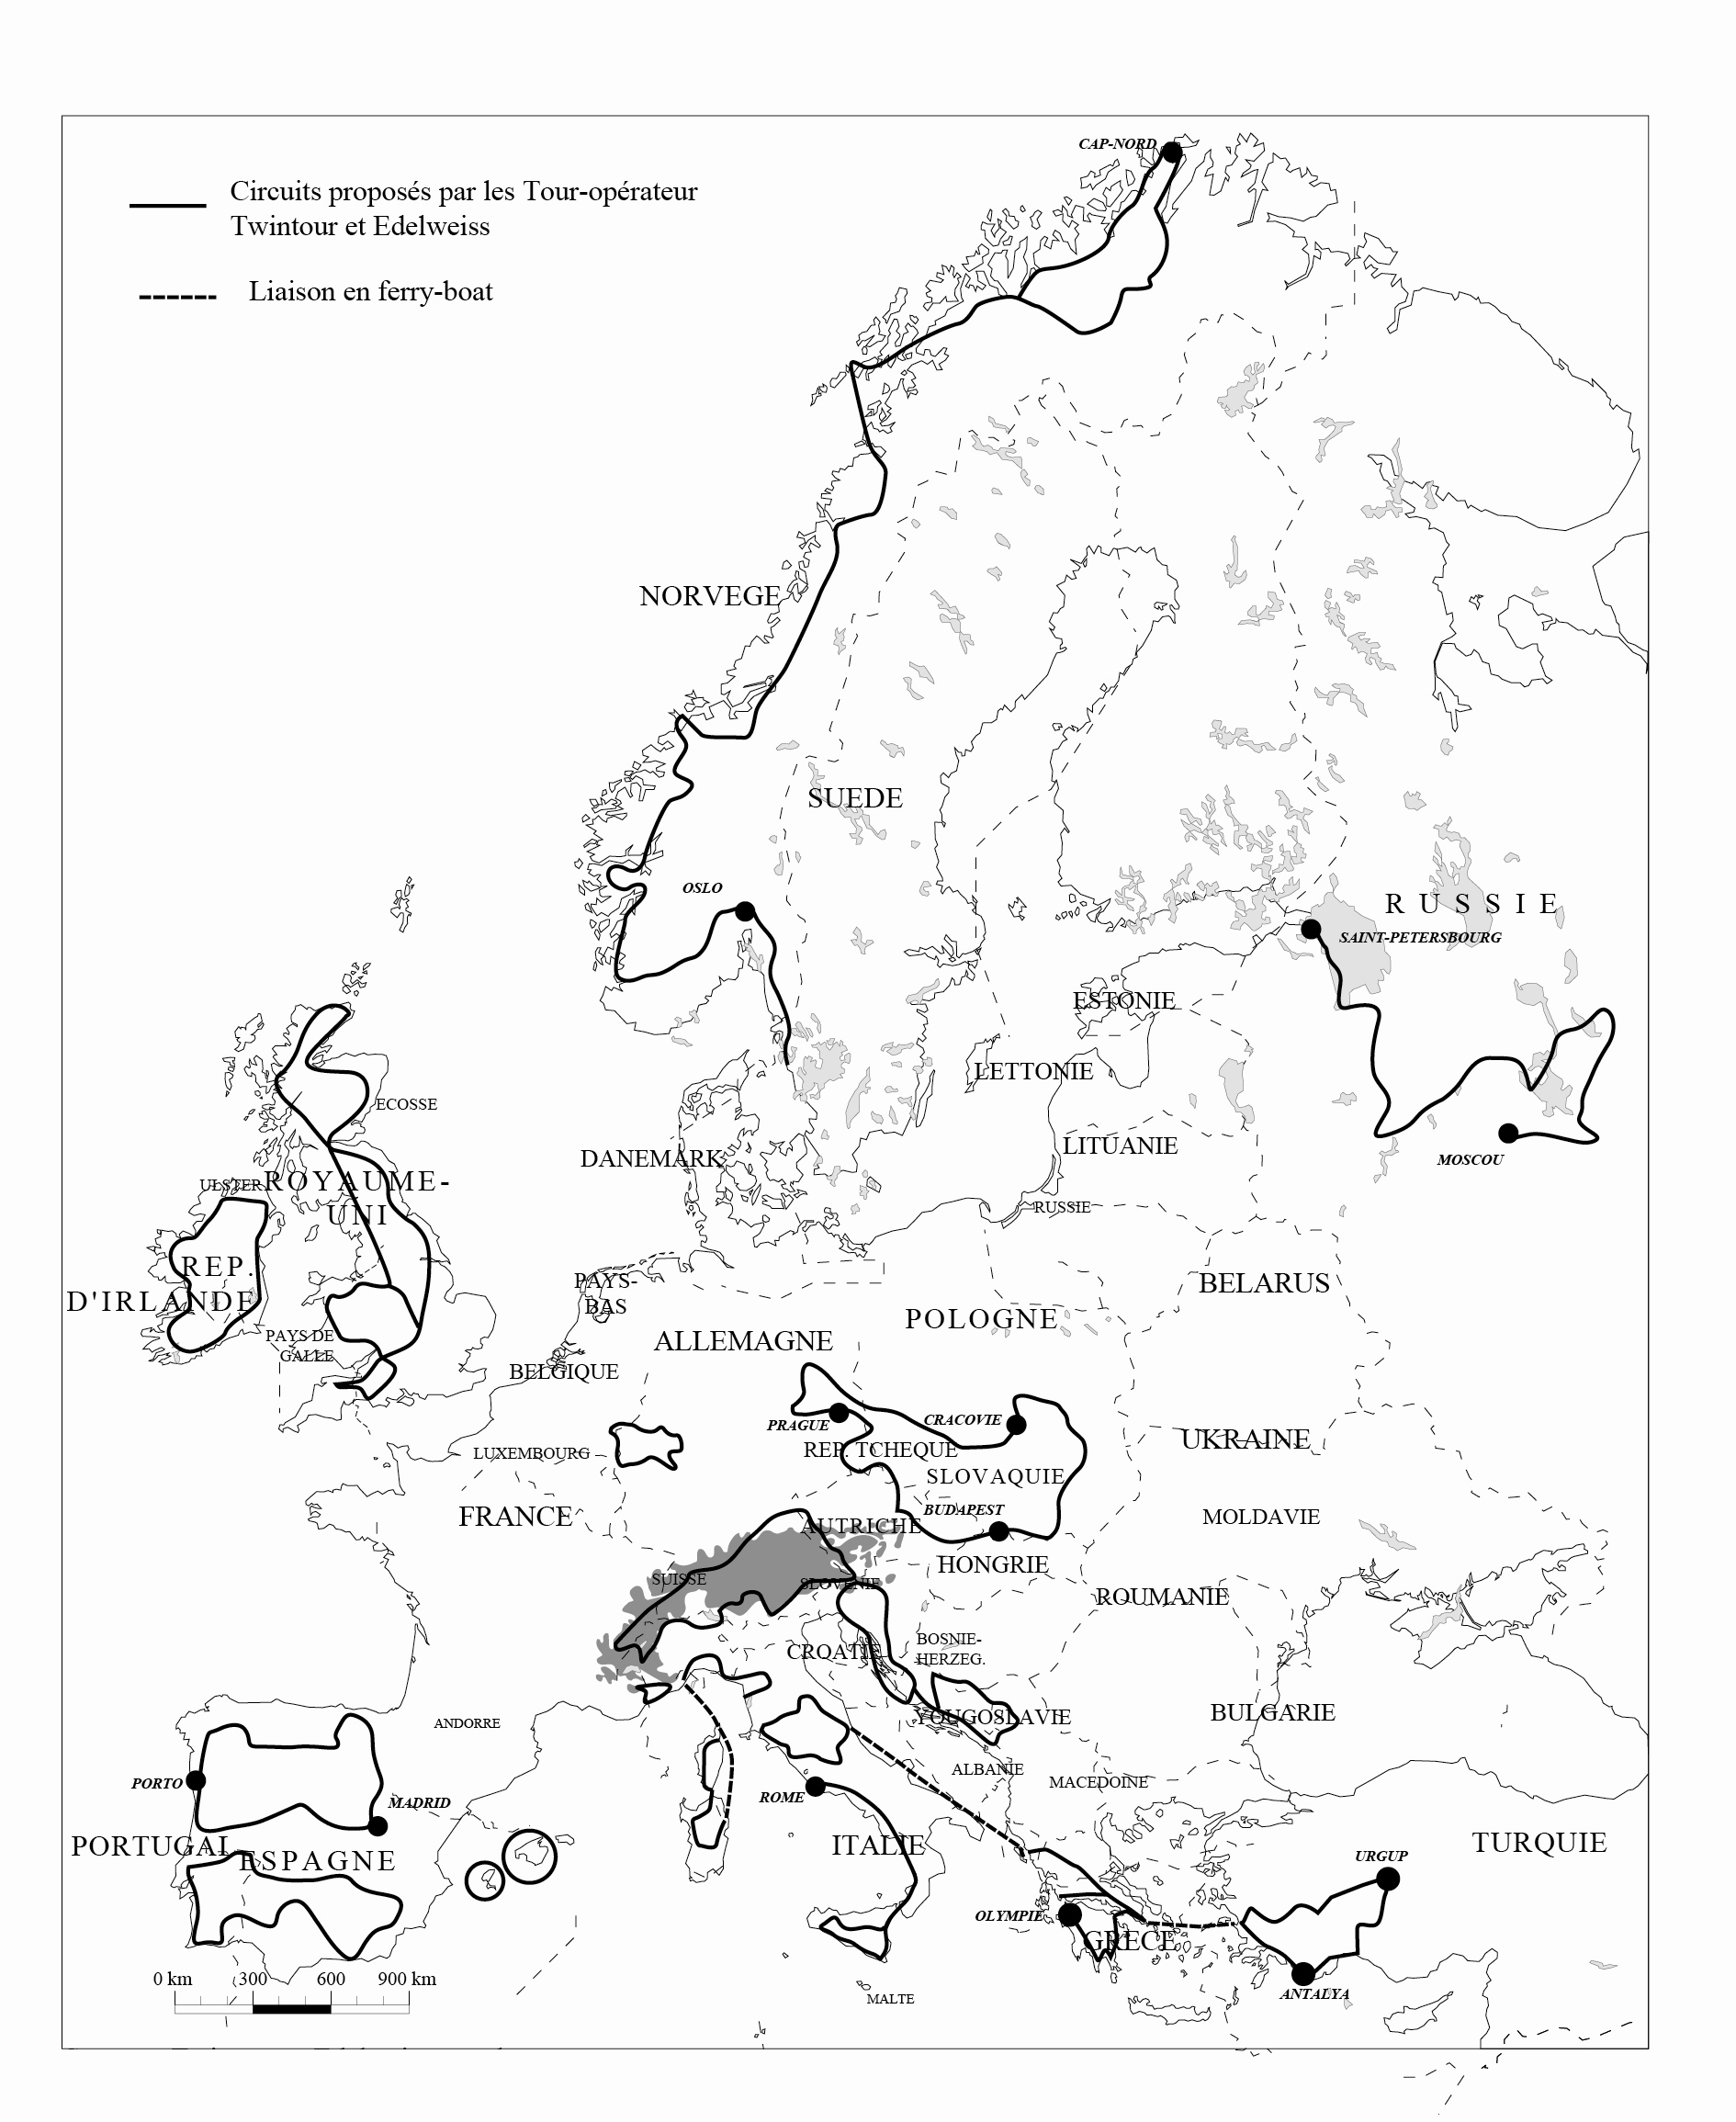 5478aeb3c Mototurismo: geographias renovadas de um fenômeno marginal